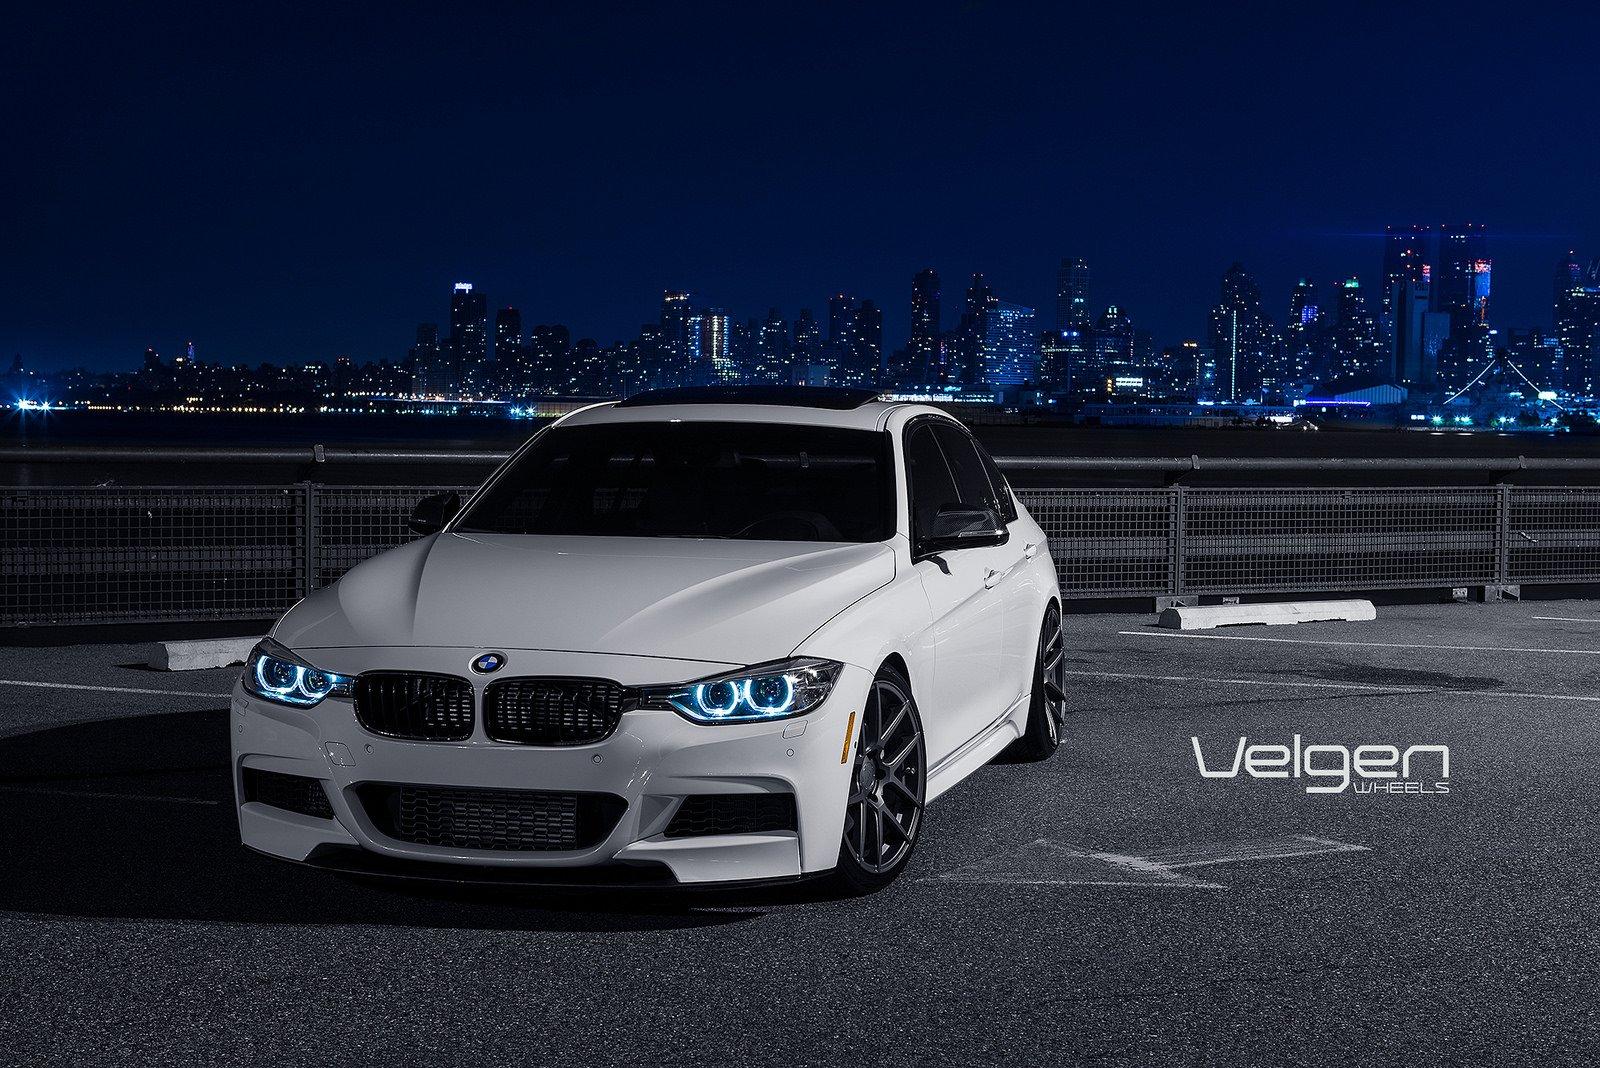 BMW F30 cars tuning Velgen Wheels wallpaper 1600x1068 502863 1600x1068